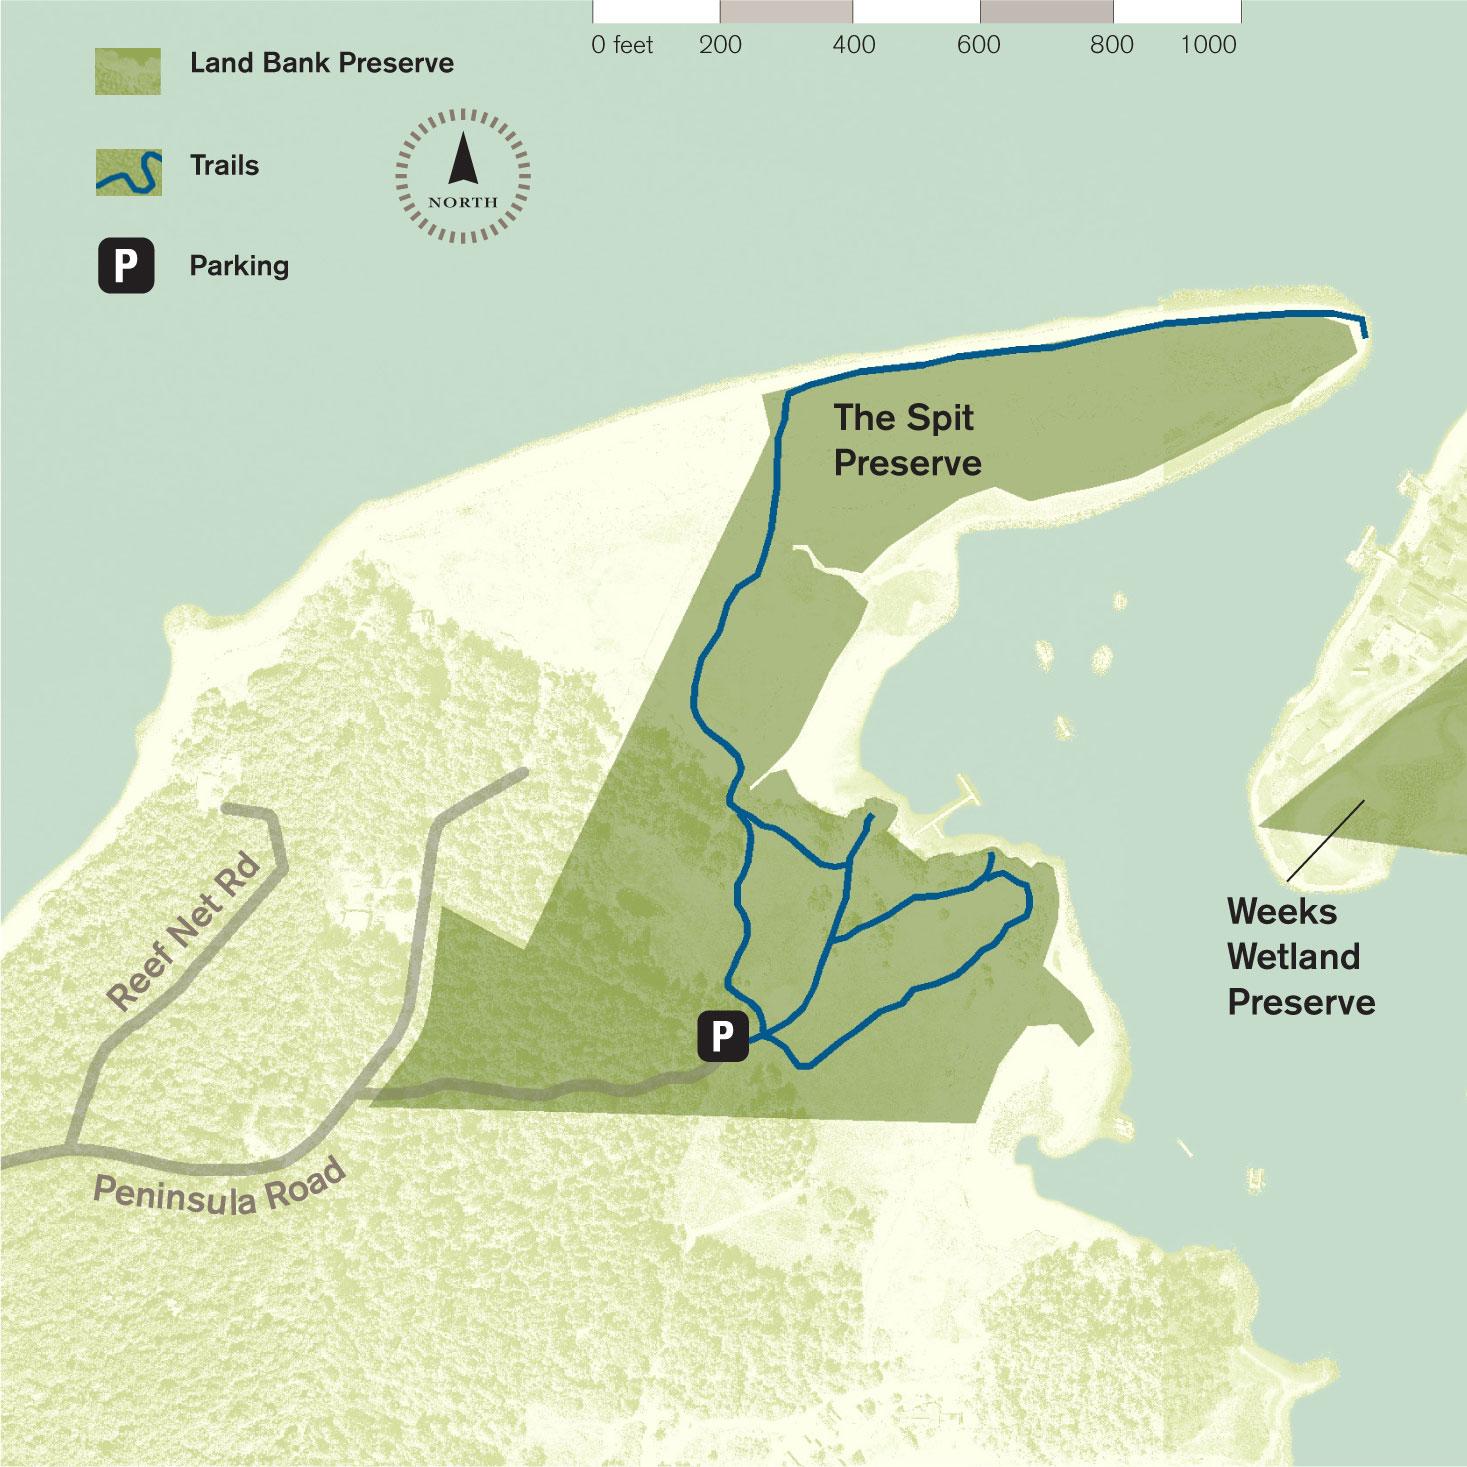 Fisherman Bay Preserve: The Spit. Image courtesy of    San Juan Land Bank Preserve   .